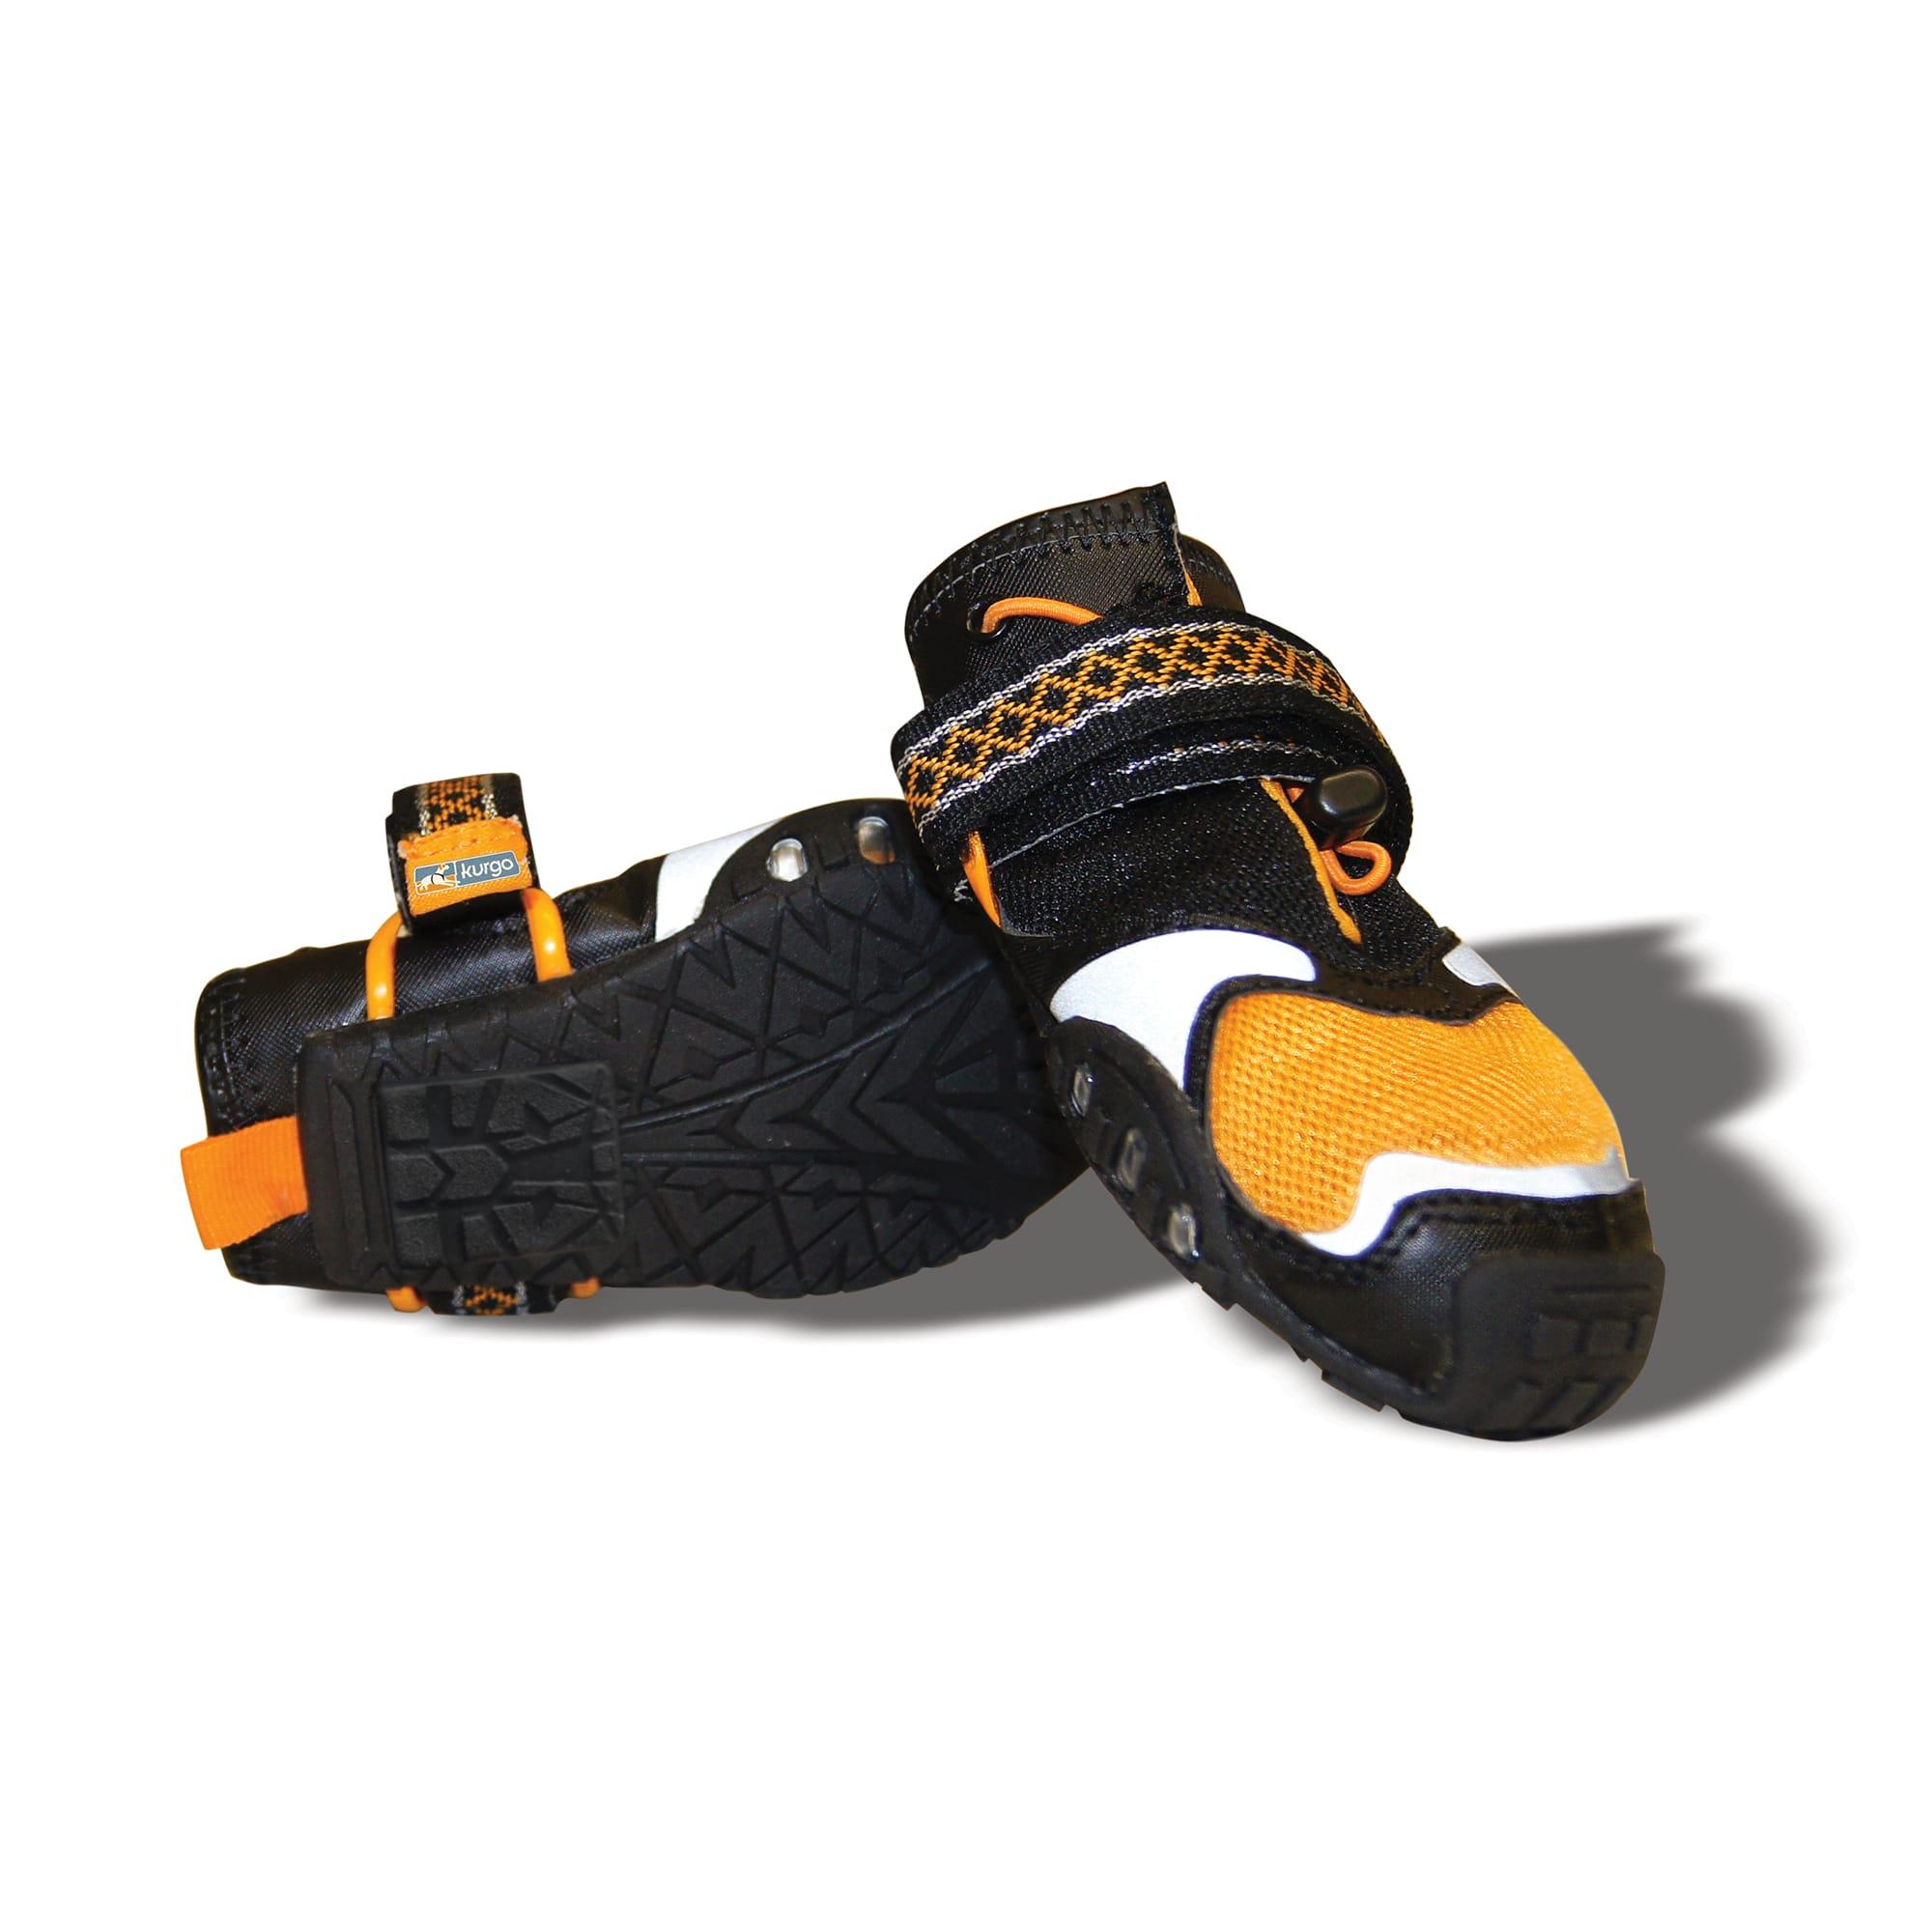 Kurgo Step N Strobe Dog Shoes Small